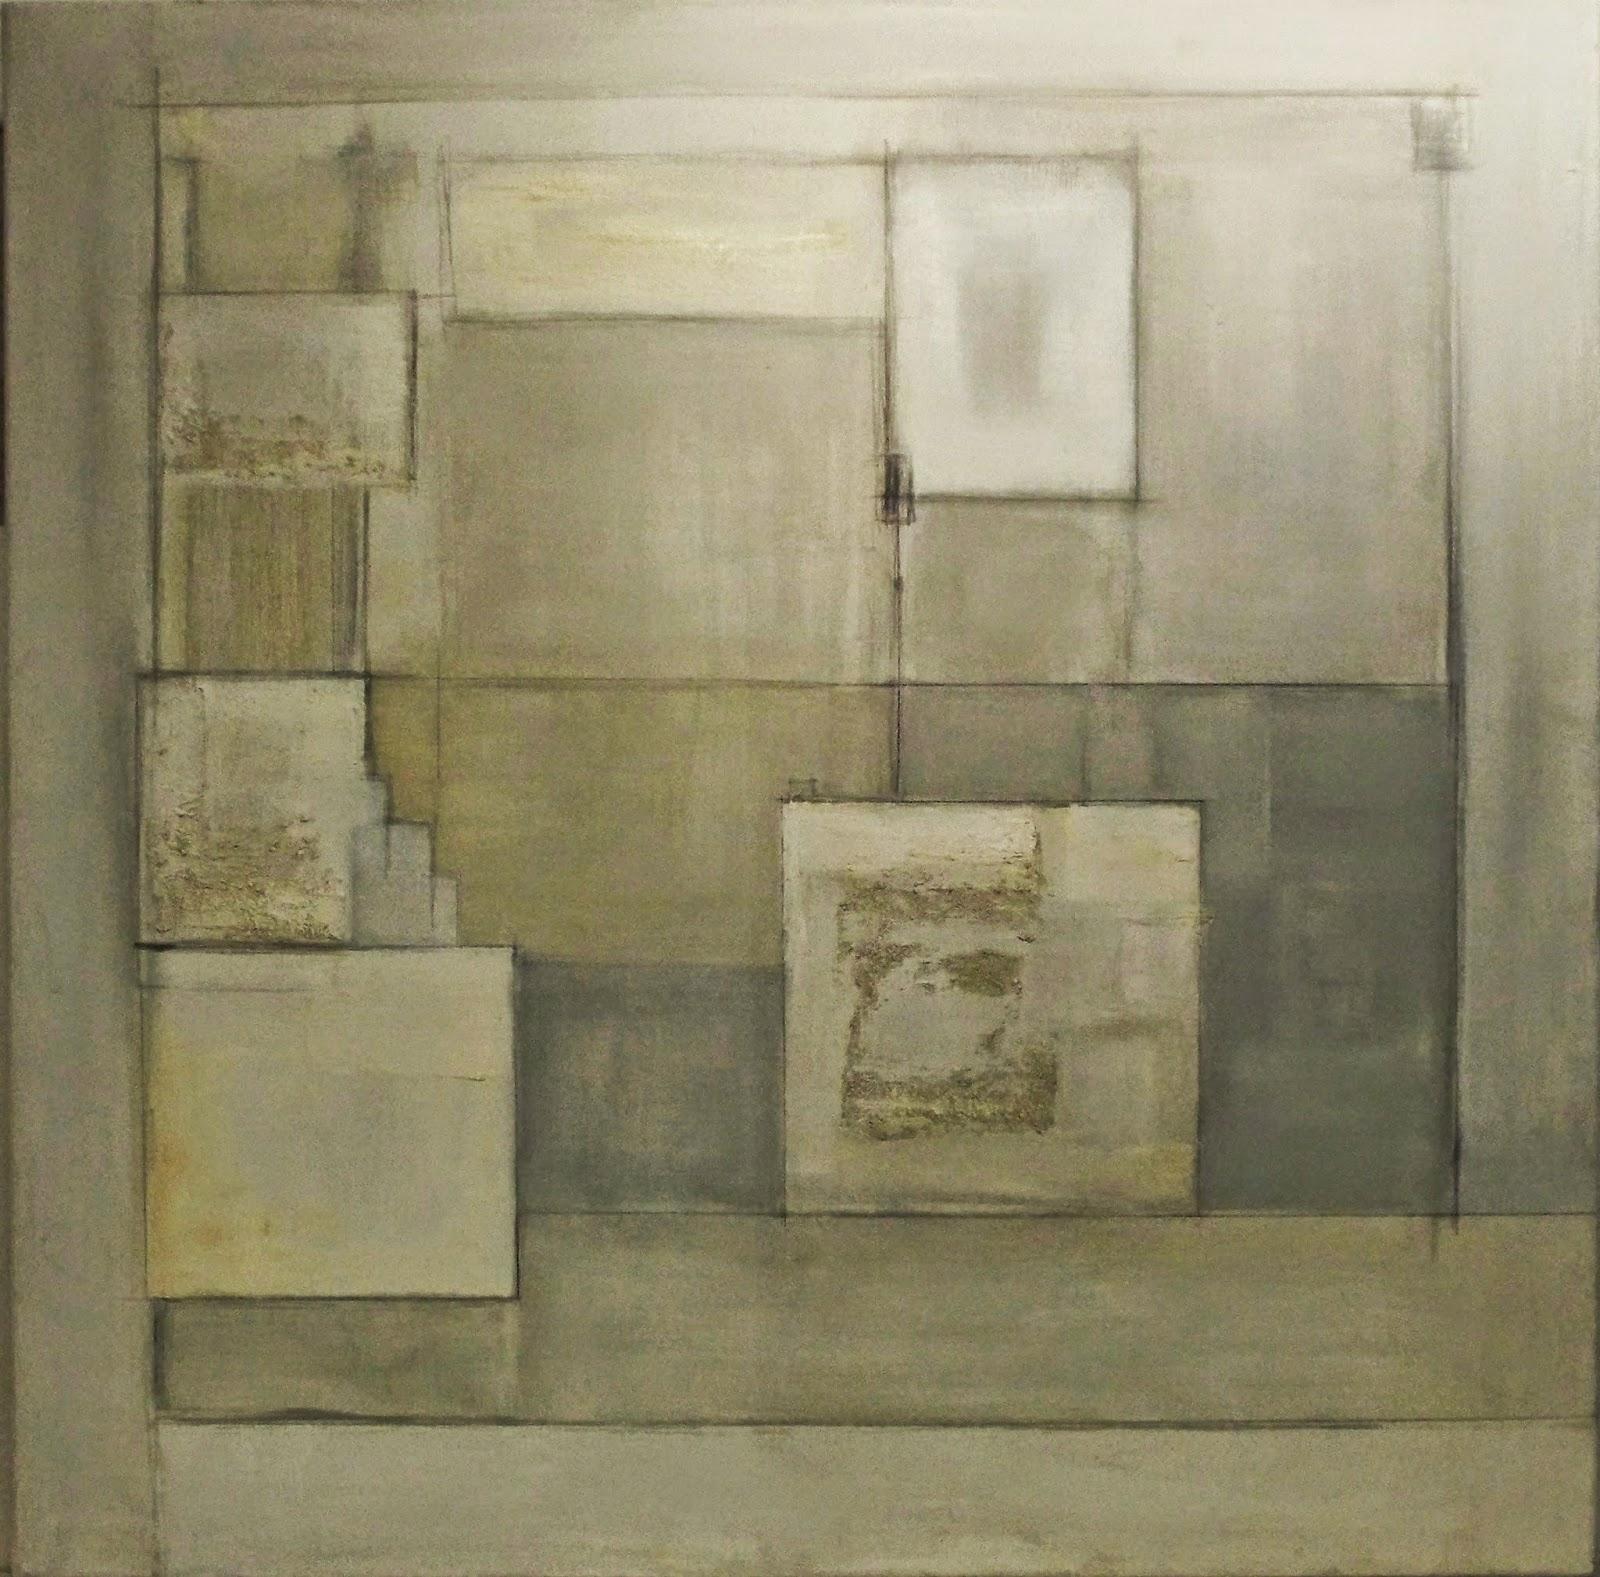 Pinturas abstractas de vanina martinez blancas - Cuadros con relieve modernos ...